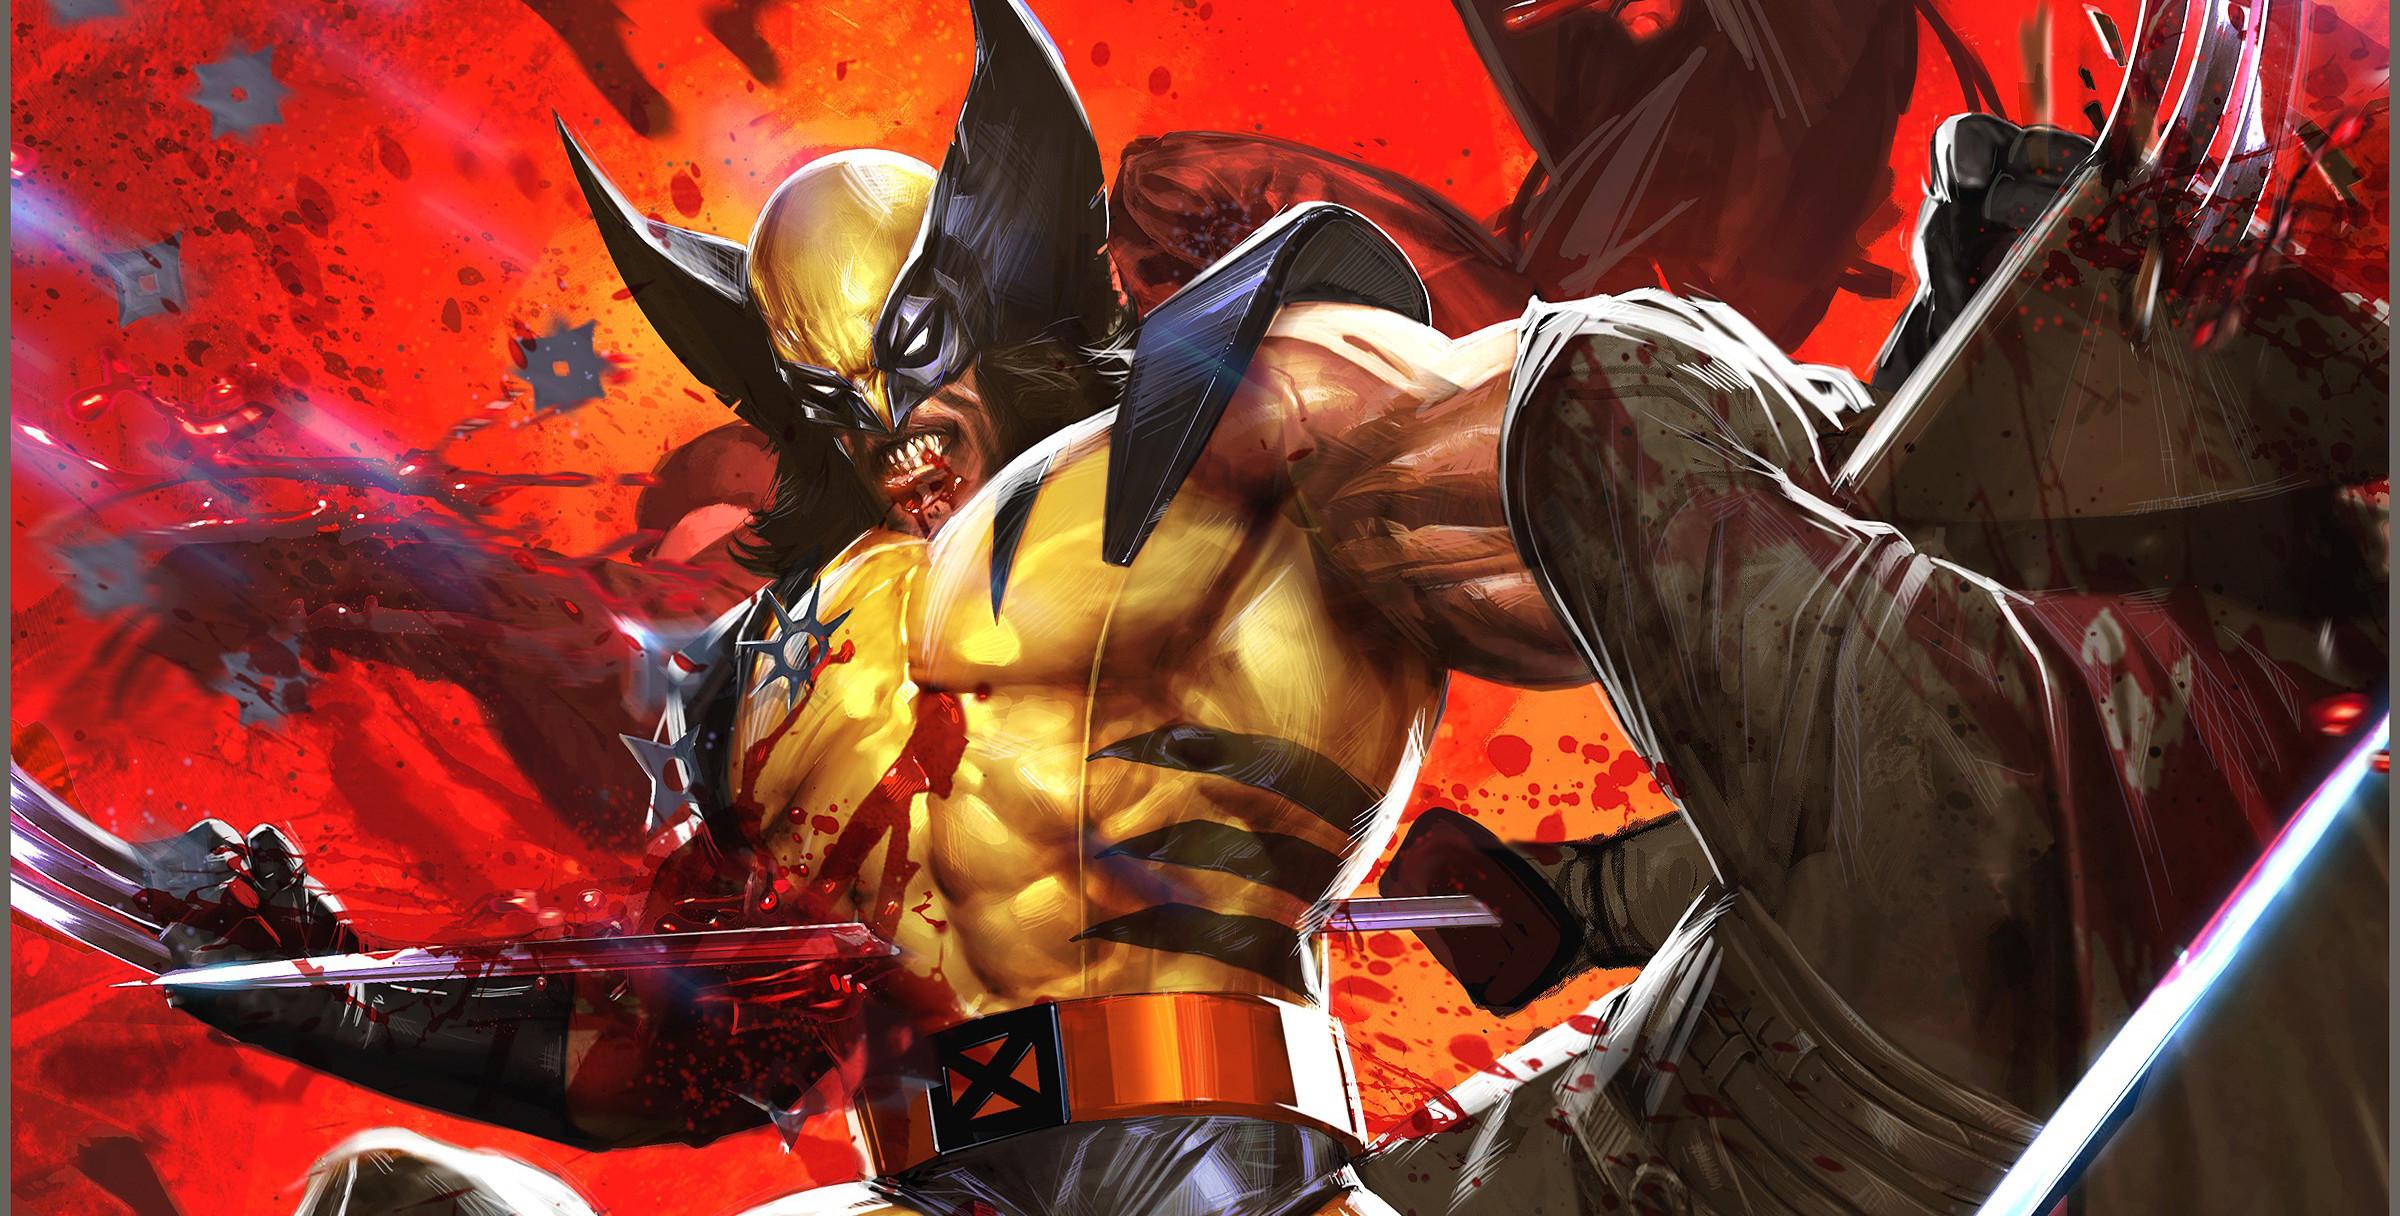 Res: 2400x1216, XMen Wolverine Fight Artwork Marvel Comics Marvel Dave Wilkins Comics  Ninjas Blood Wallpapers HD / Desktop and Mobile Backgrounds